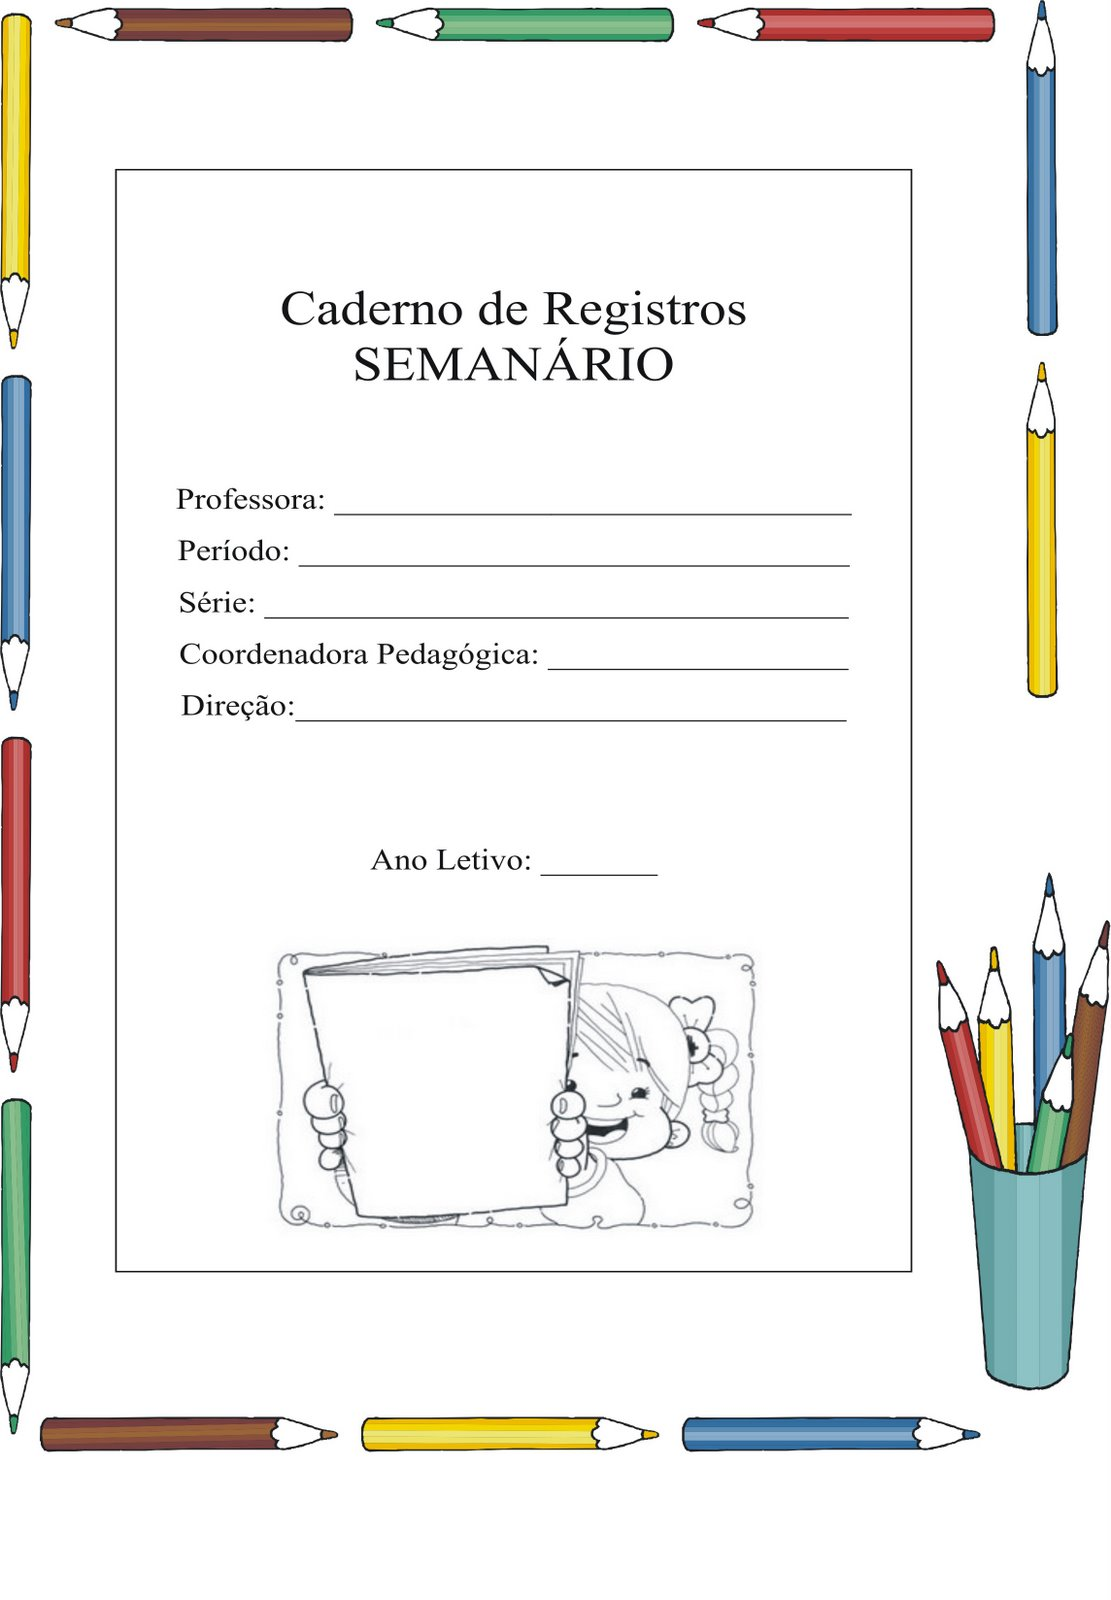 Modelos De Frente De Cadernos  Abertura De Caderno  Capas De Caderno